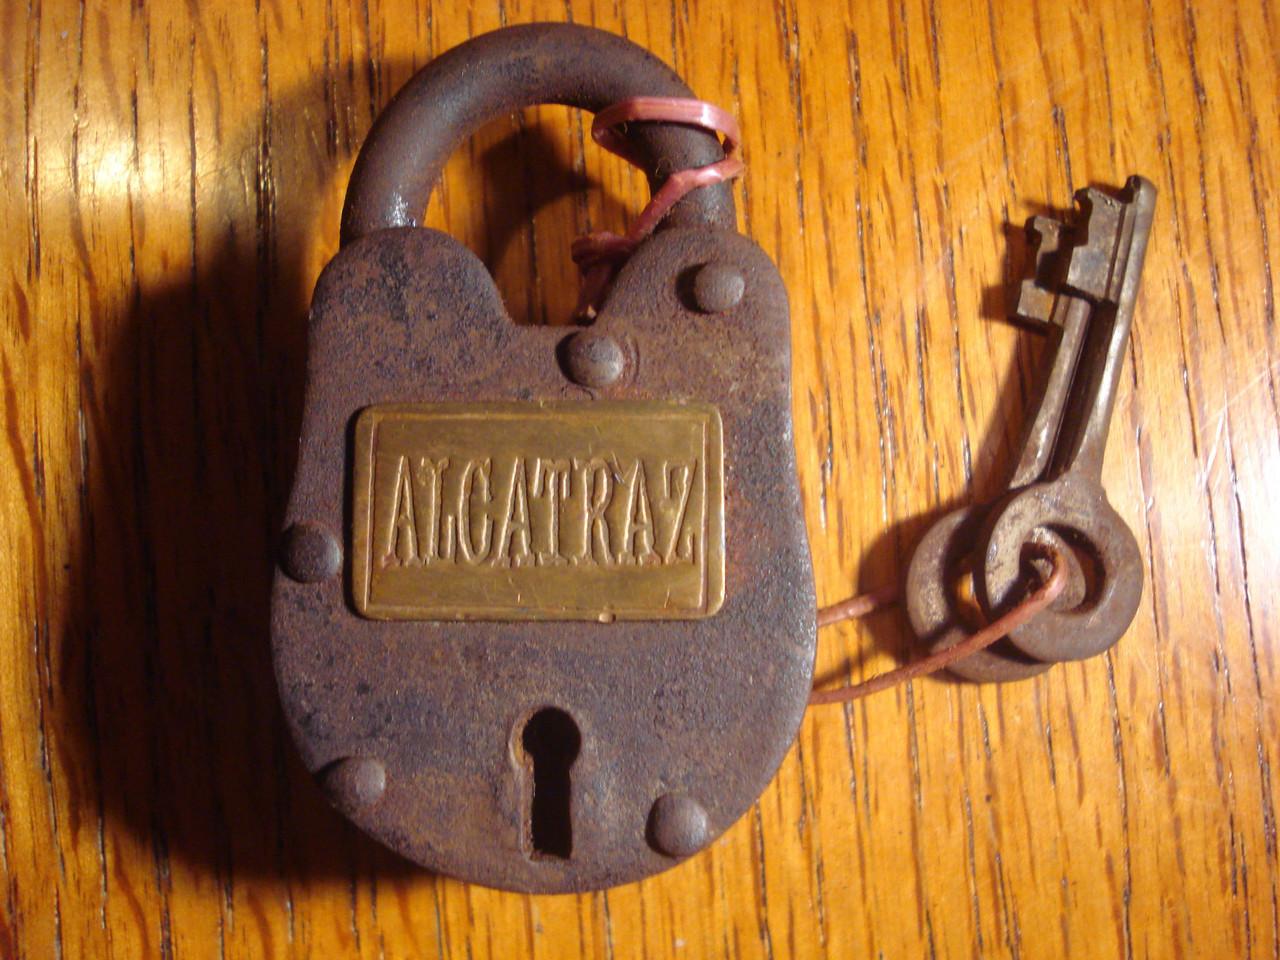 New York Insane Asylum Cast Iron Plaque Bar Shop Man Cave Decor Antique Finish